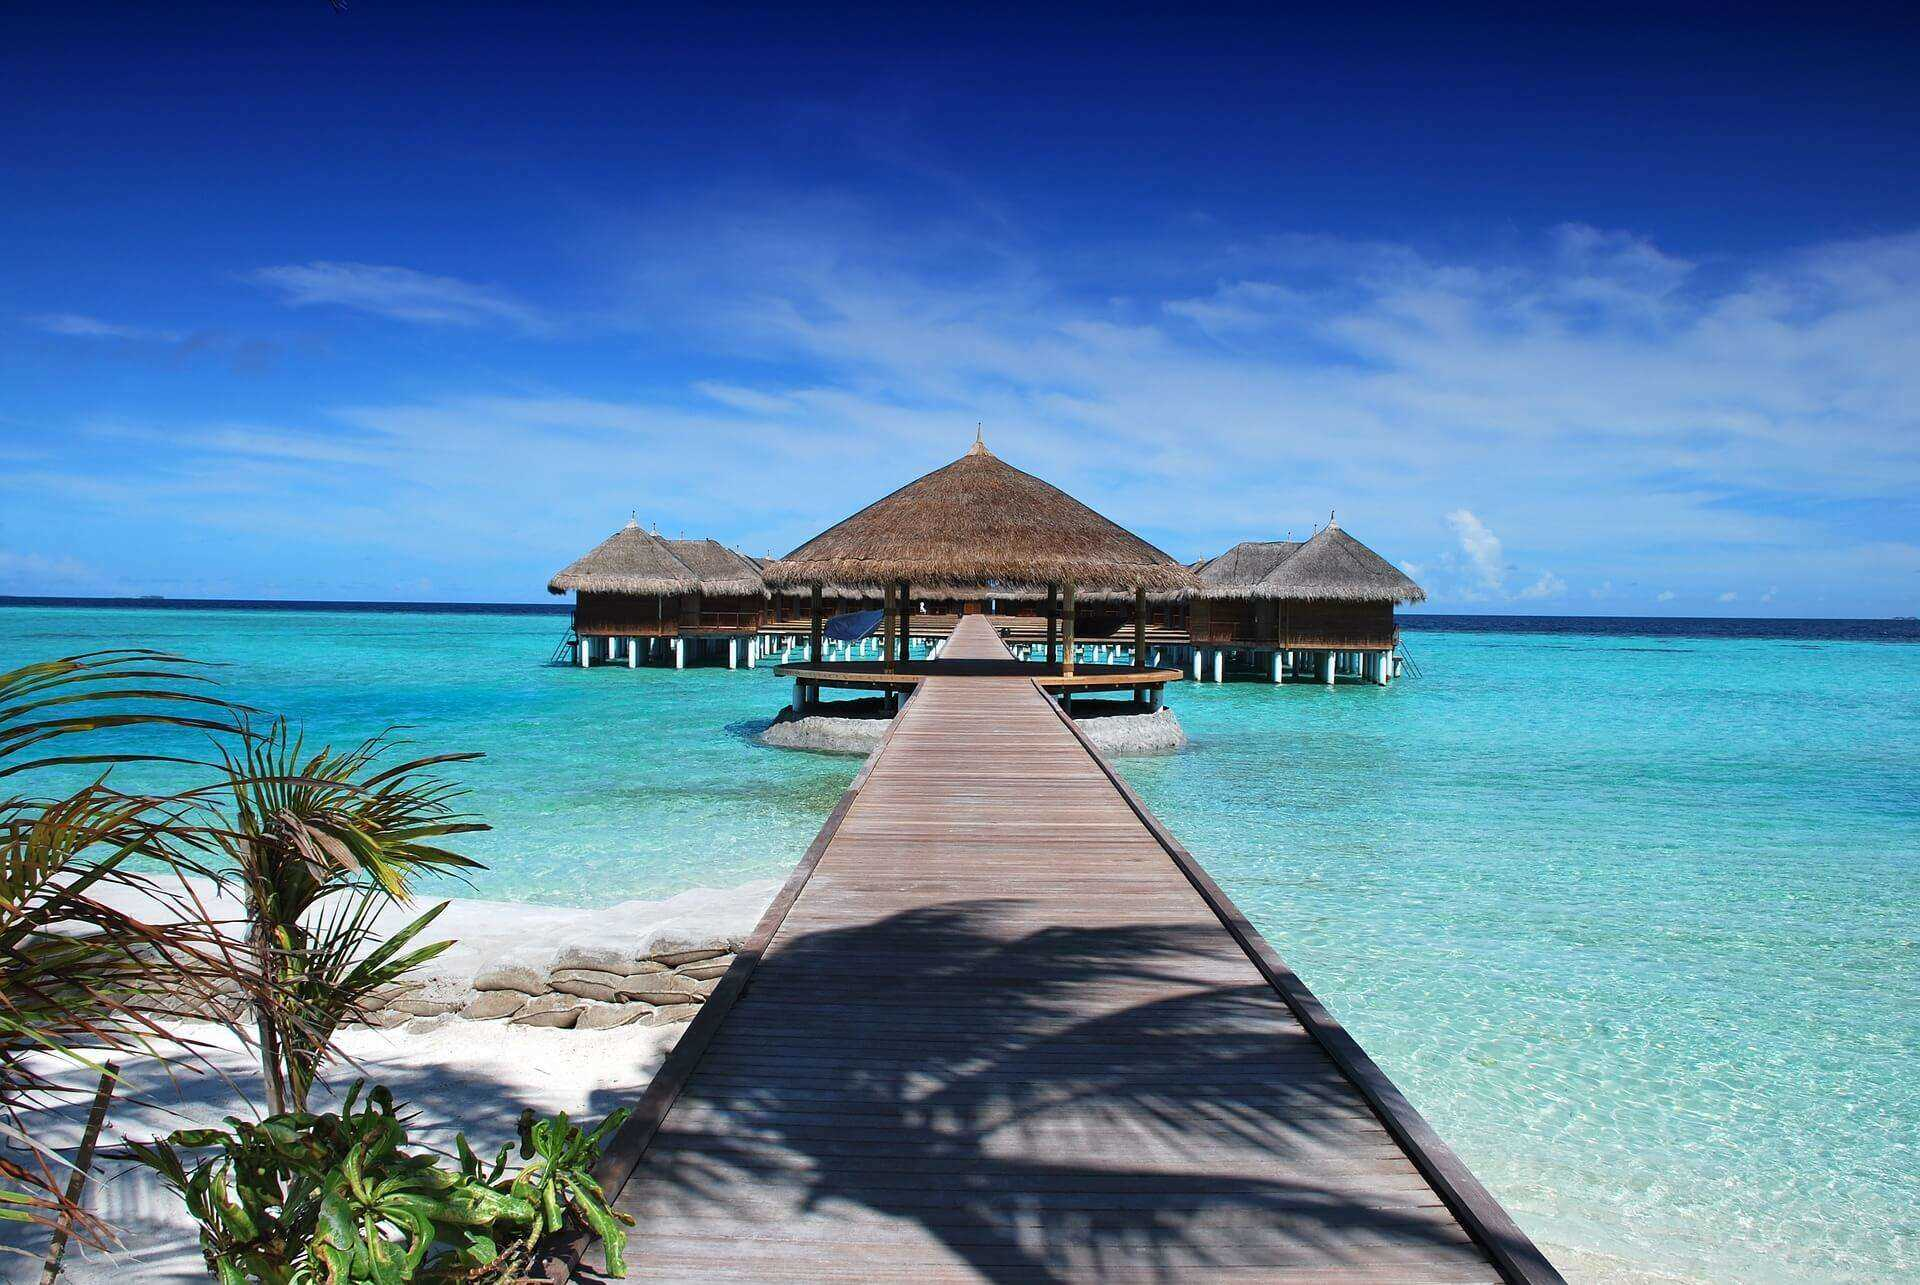 Direktflüge nach Male (Malediven)